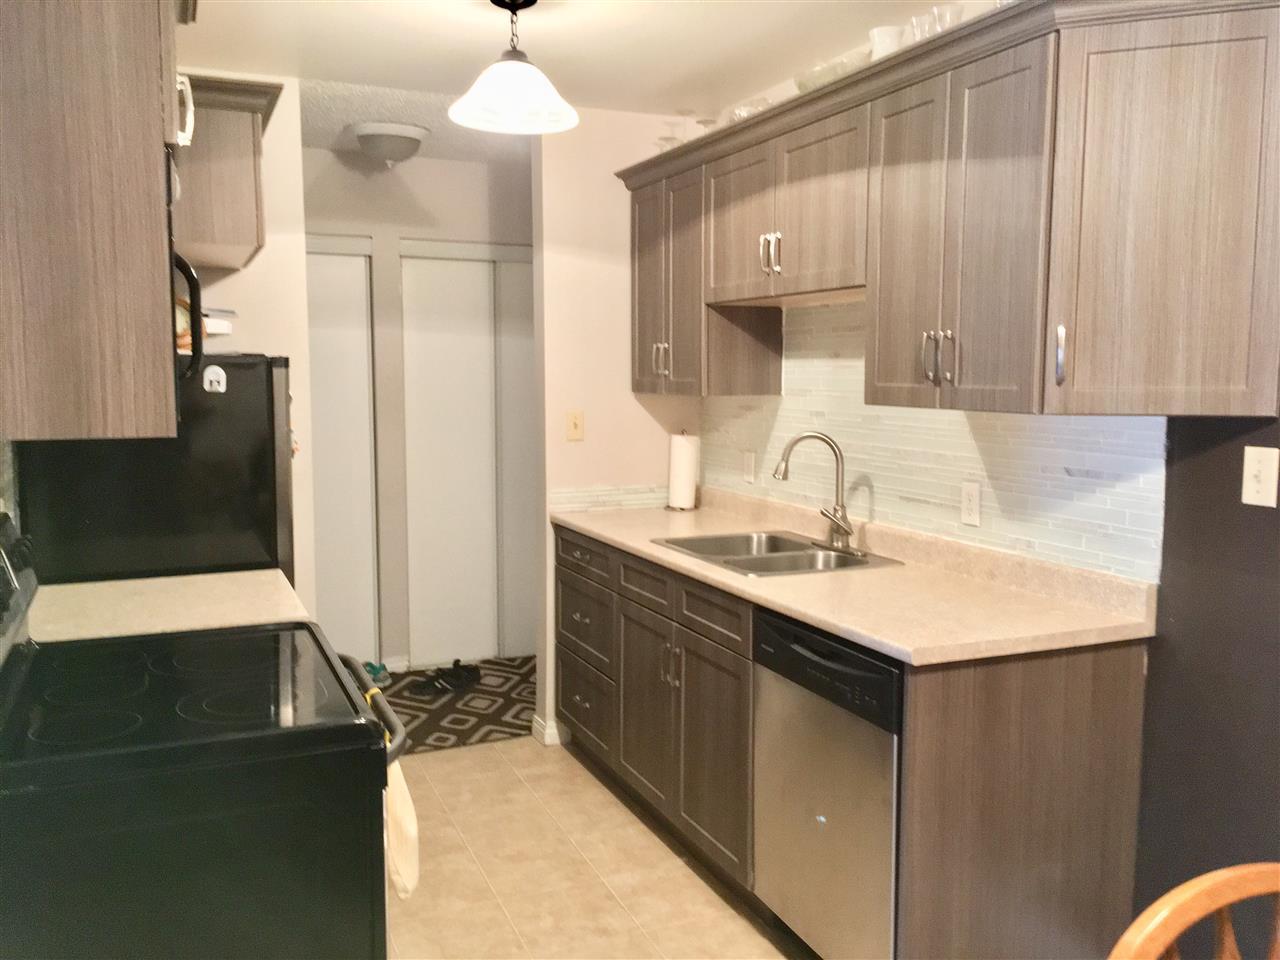 Buliding: 12915 65 Street, Edmonton, AB